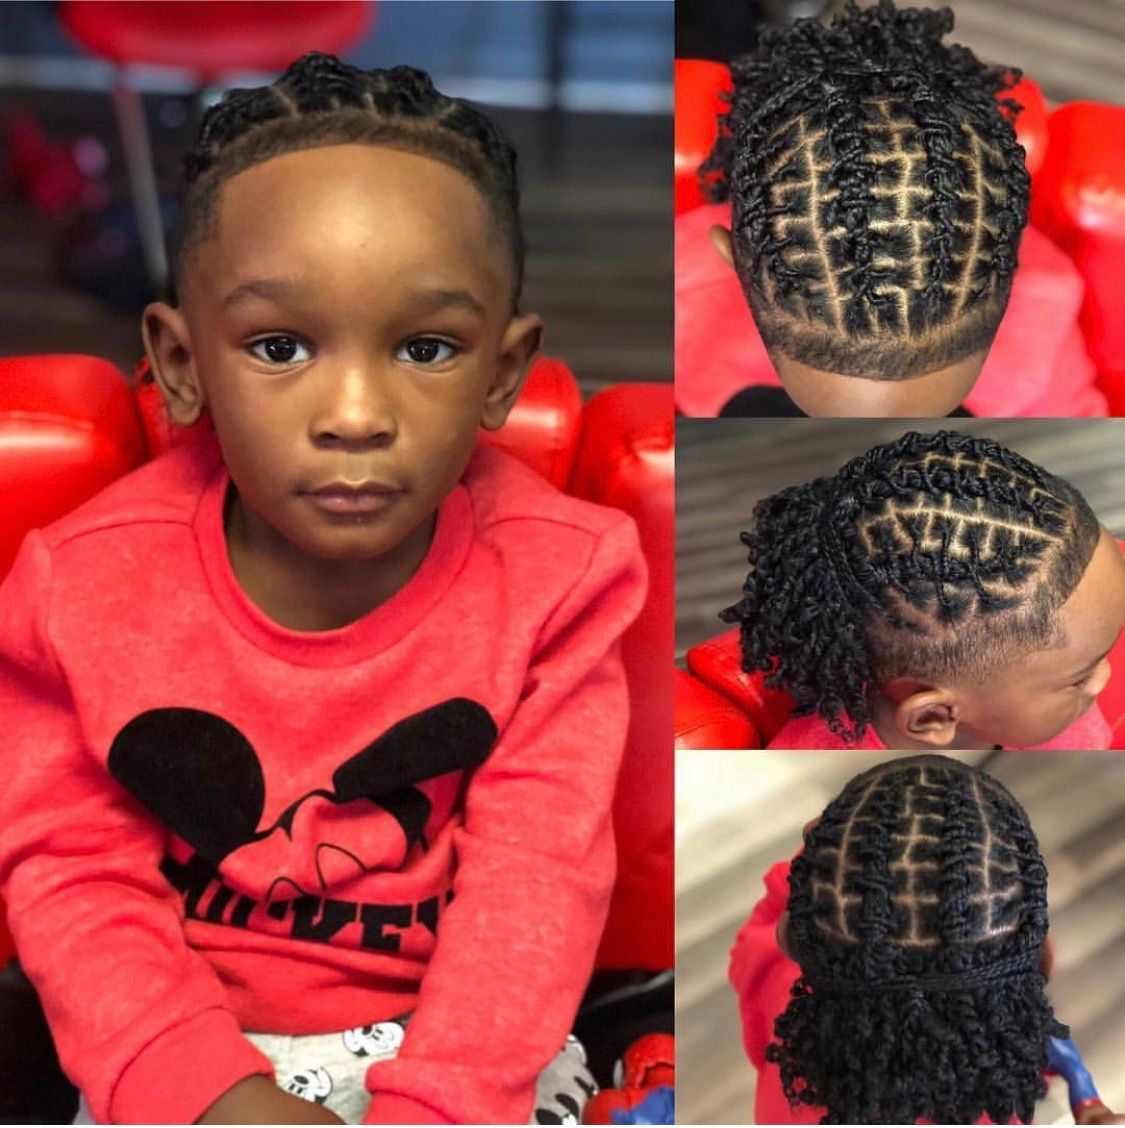 Pin By Sandy Cijntje On Goals Dreadlock Hairstyles For Men Dreadlock Hairstyles Braids For Boys